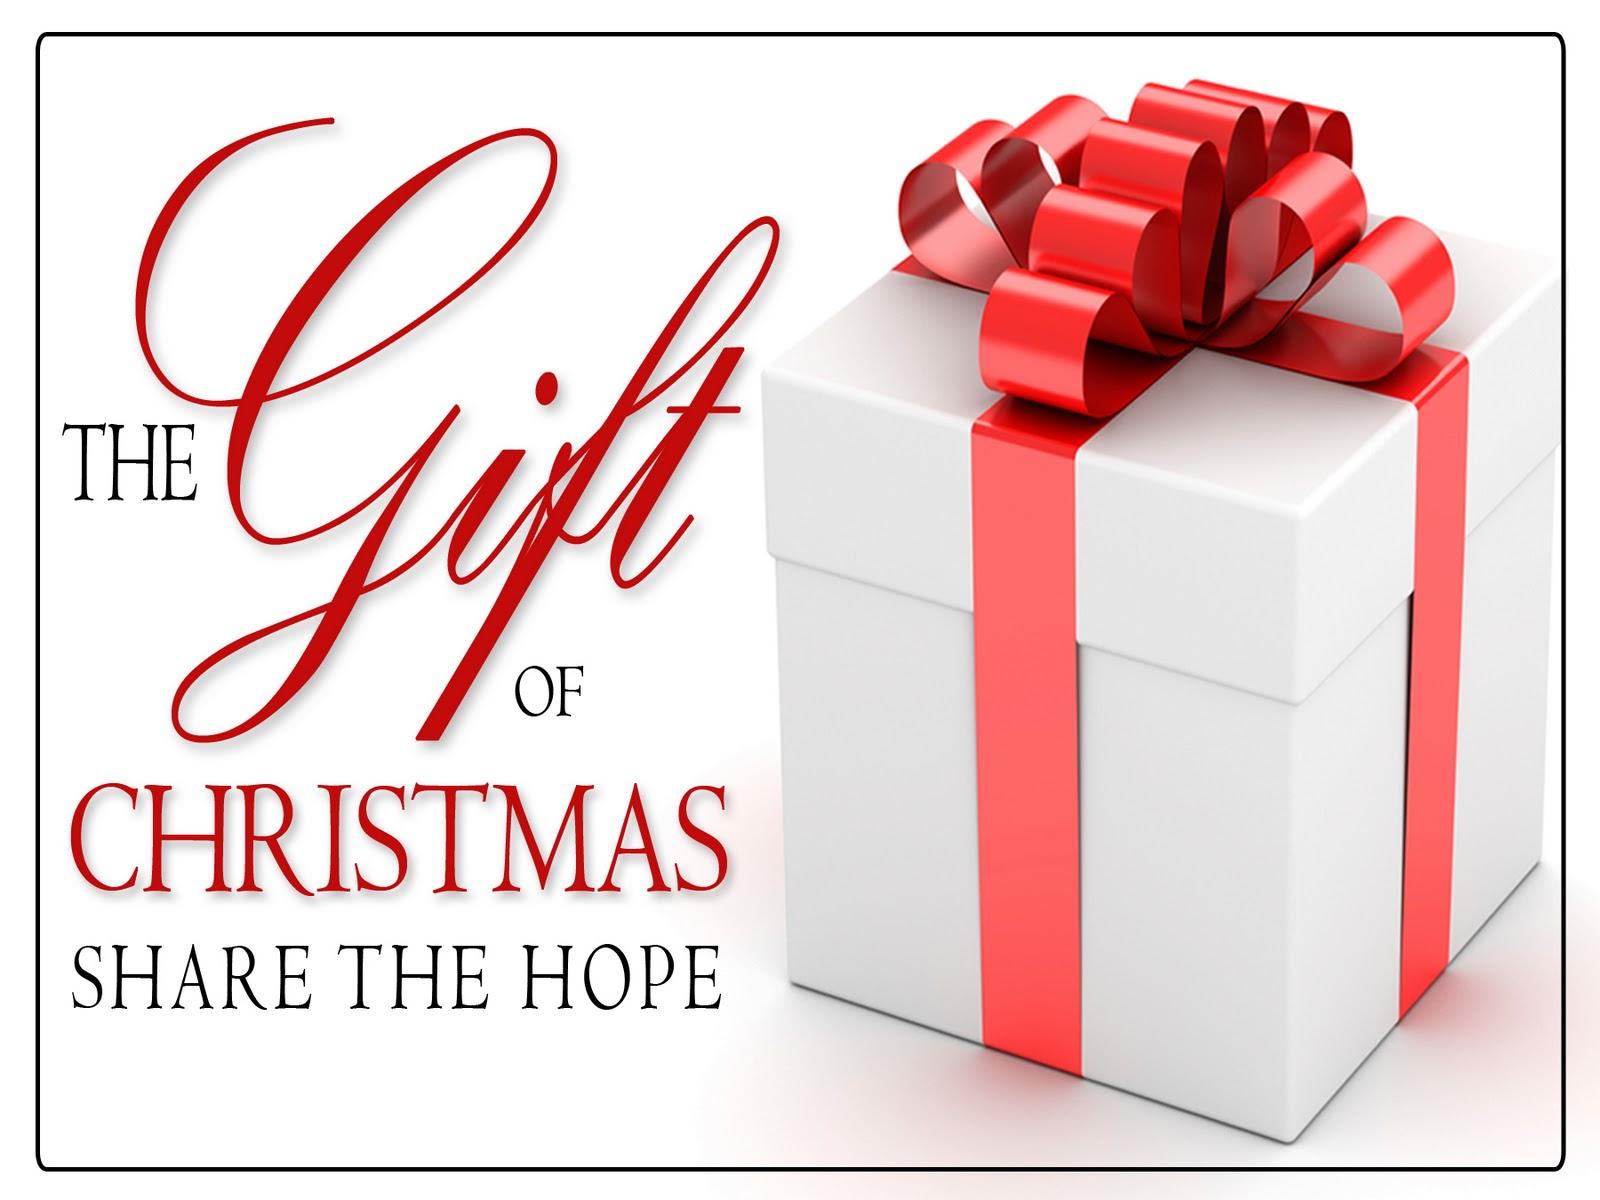 Gift Of Christmas.Gift Of Christmas Seeds Of Hope International Partnerships